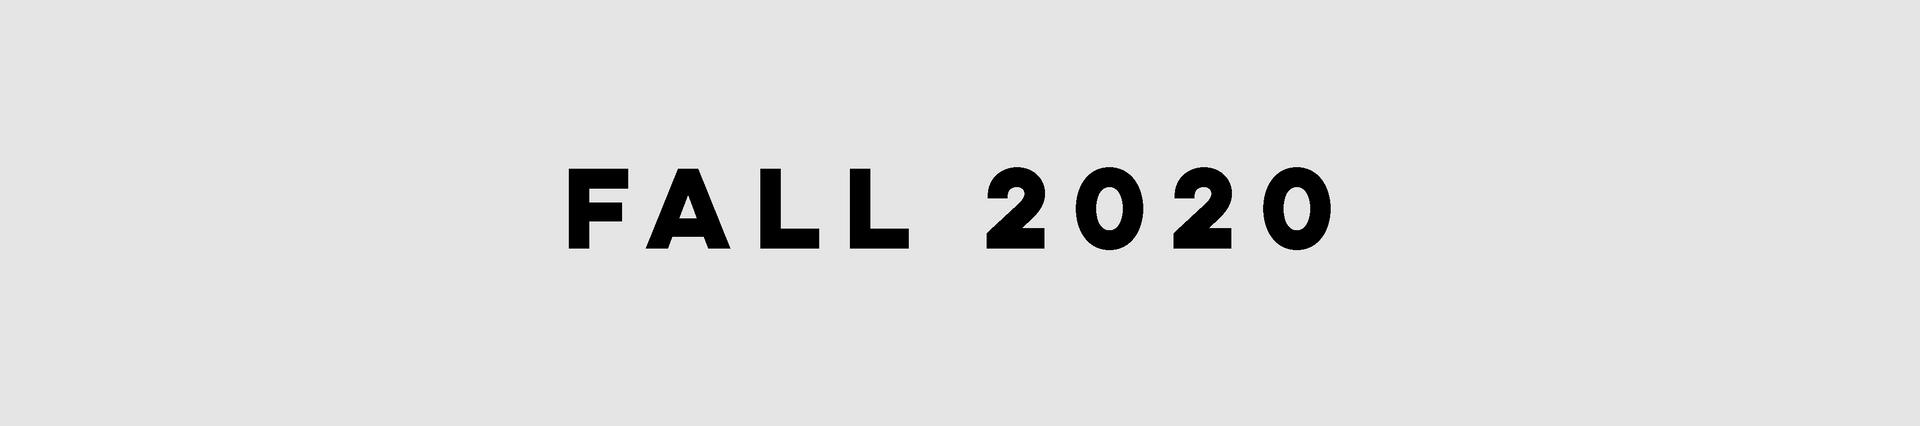 OGI Fall 2020